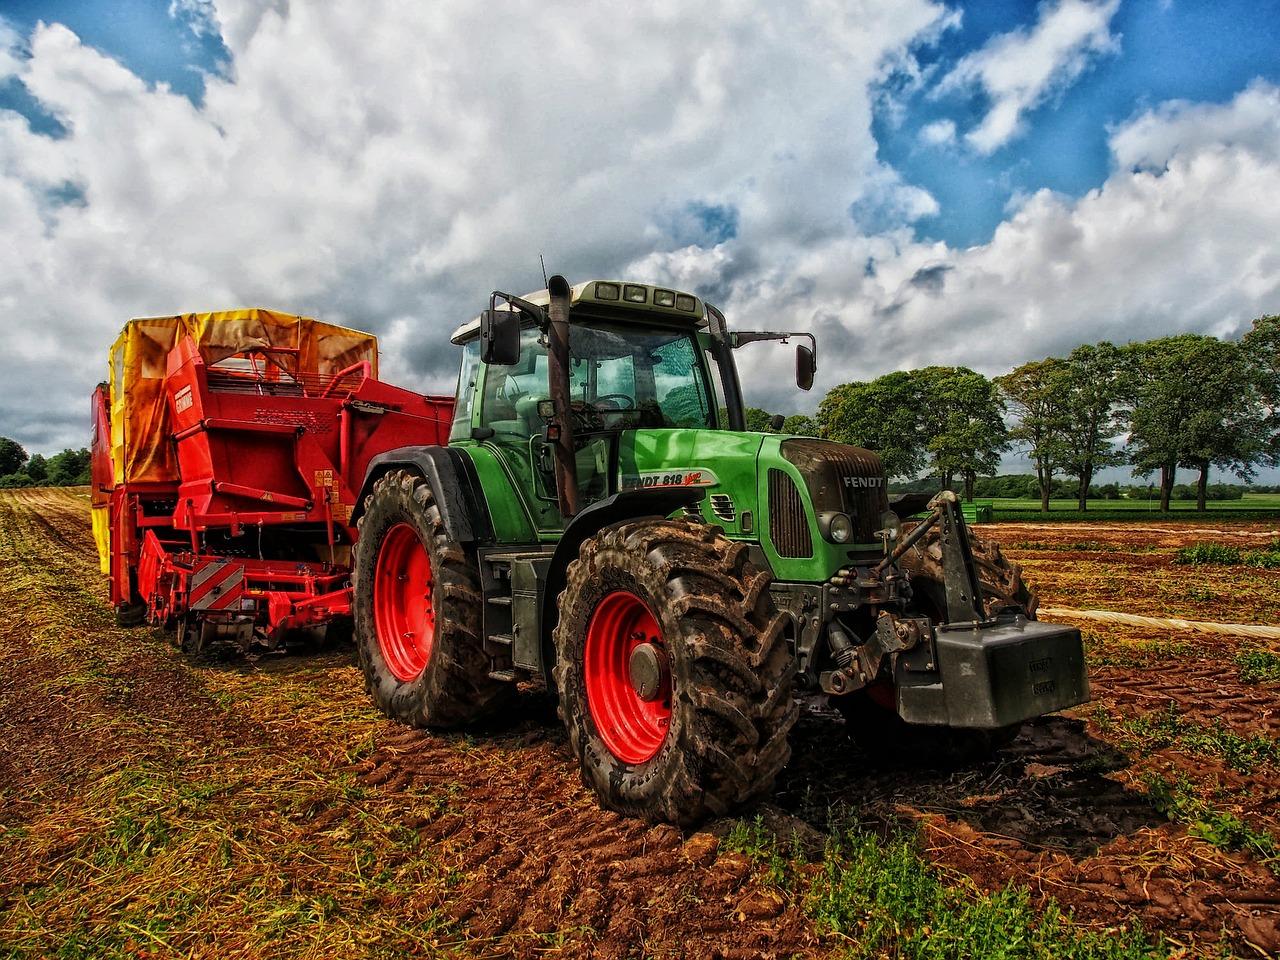 tractor-385681_1280.jpg